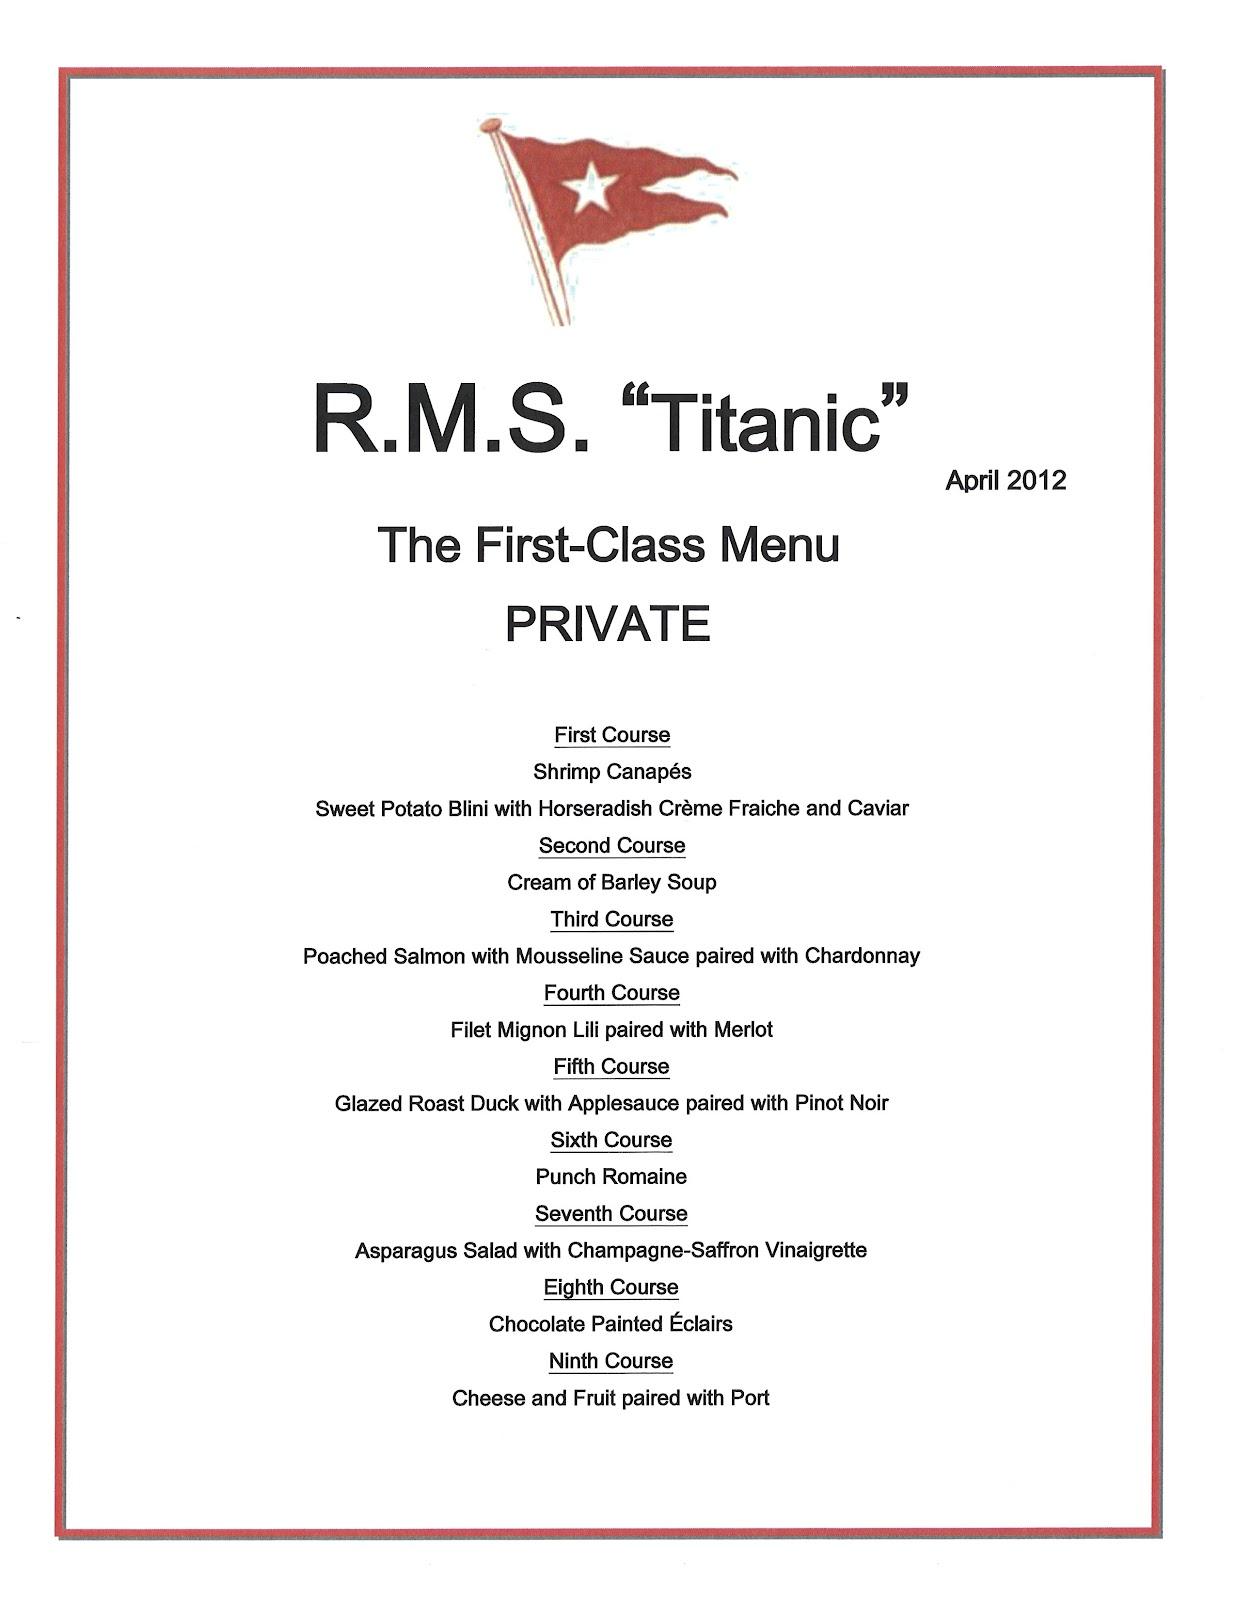 Titanic Third Class Menu 100th Anniversary Celebrating The Titanic Dinner And Tea